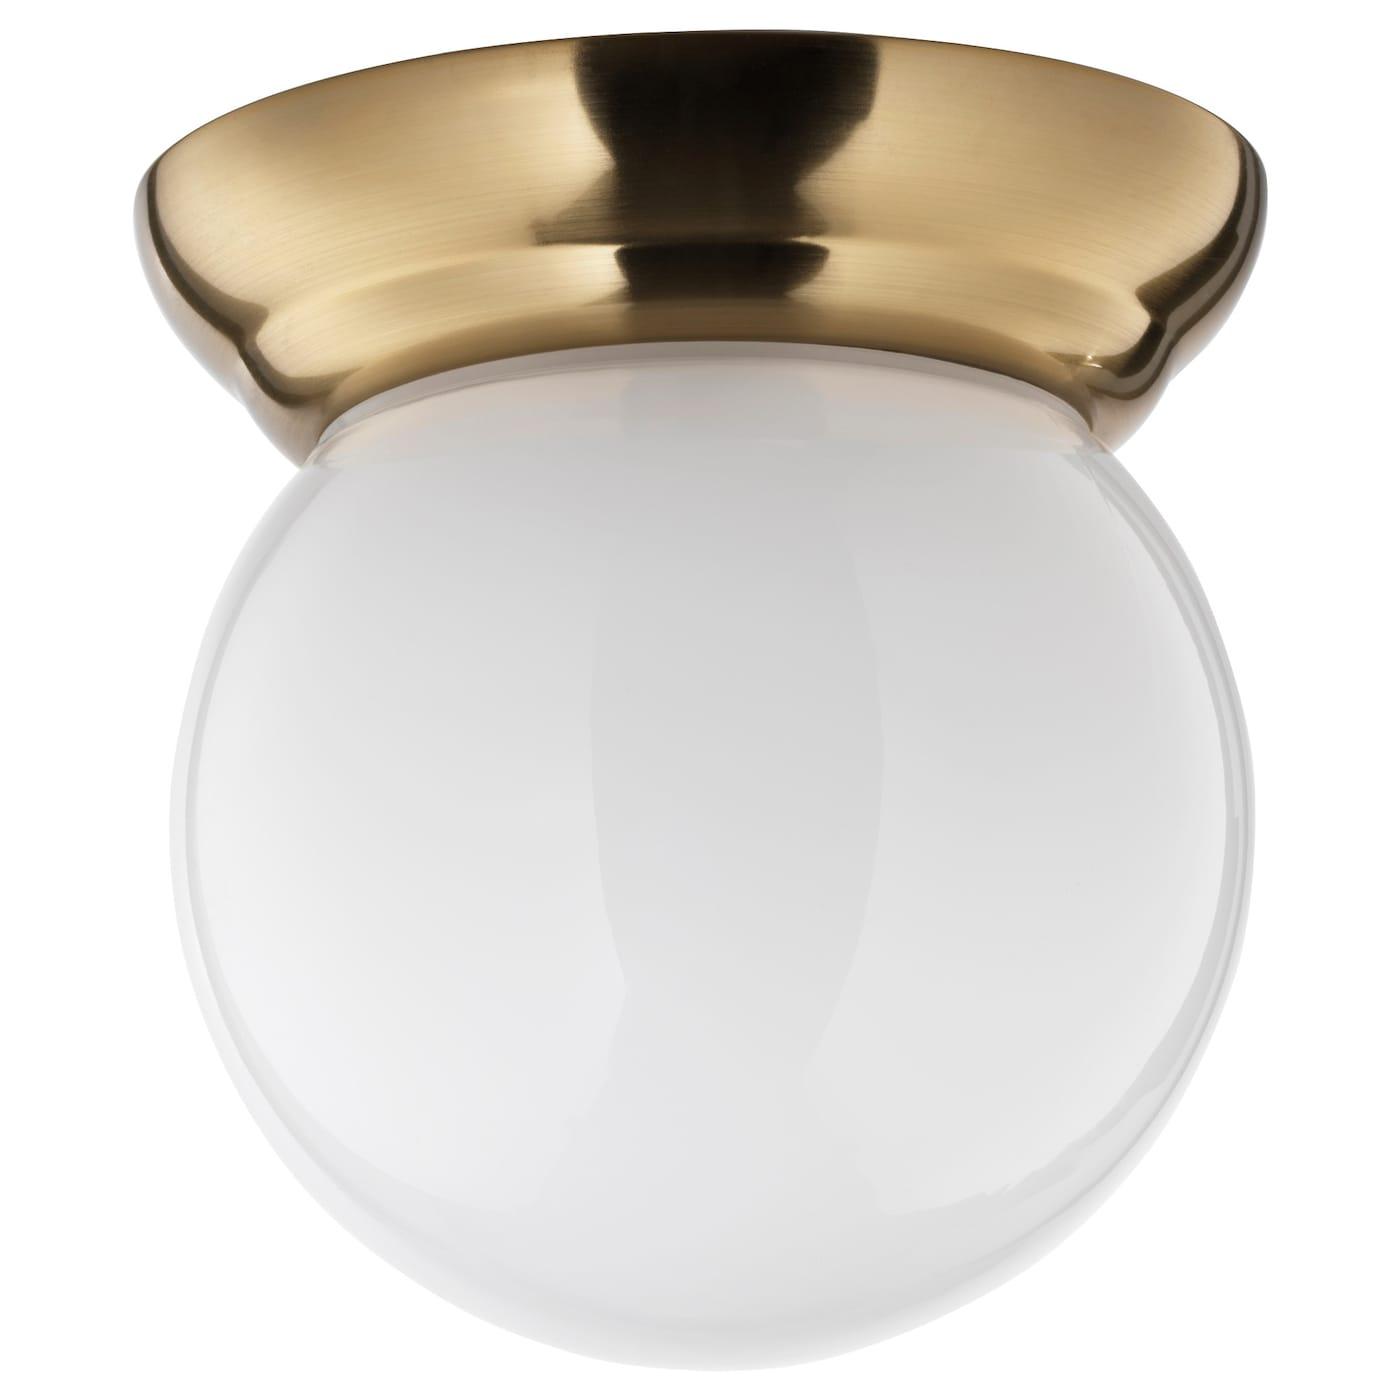 Luminaire eclairage salle de bain ikea - Ikea plafonnier salle de bain ...